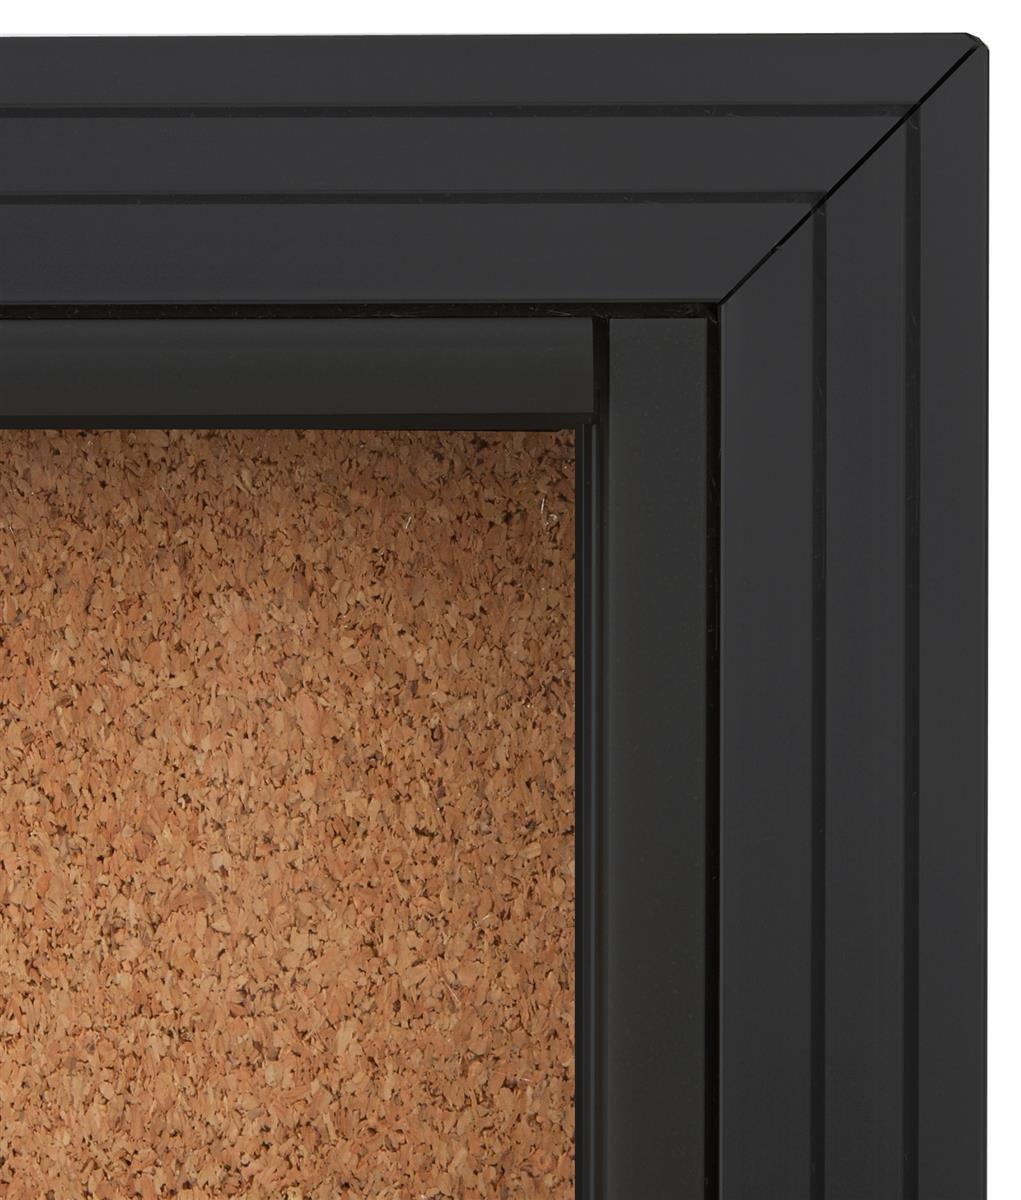 Amazon.com : Displays2go Enclosed Cork Board Sliding Glass Door 4\u0027 x 3\u0027 Locking Bulletin Board for Wall (CBSD43BK) : Enclosed Literature Board : Office ... & Amazon.com : Displays2go Enclosed Cork Board Sliding Glass Door ... Pezcame.Com